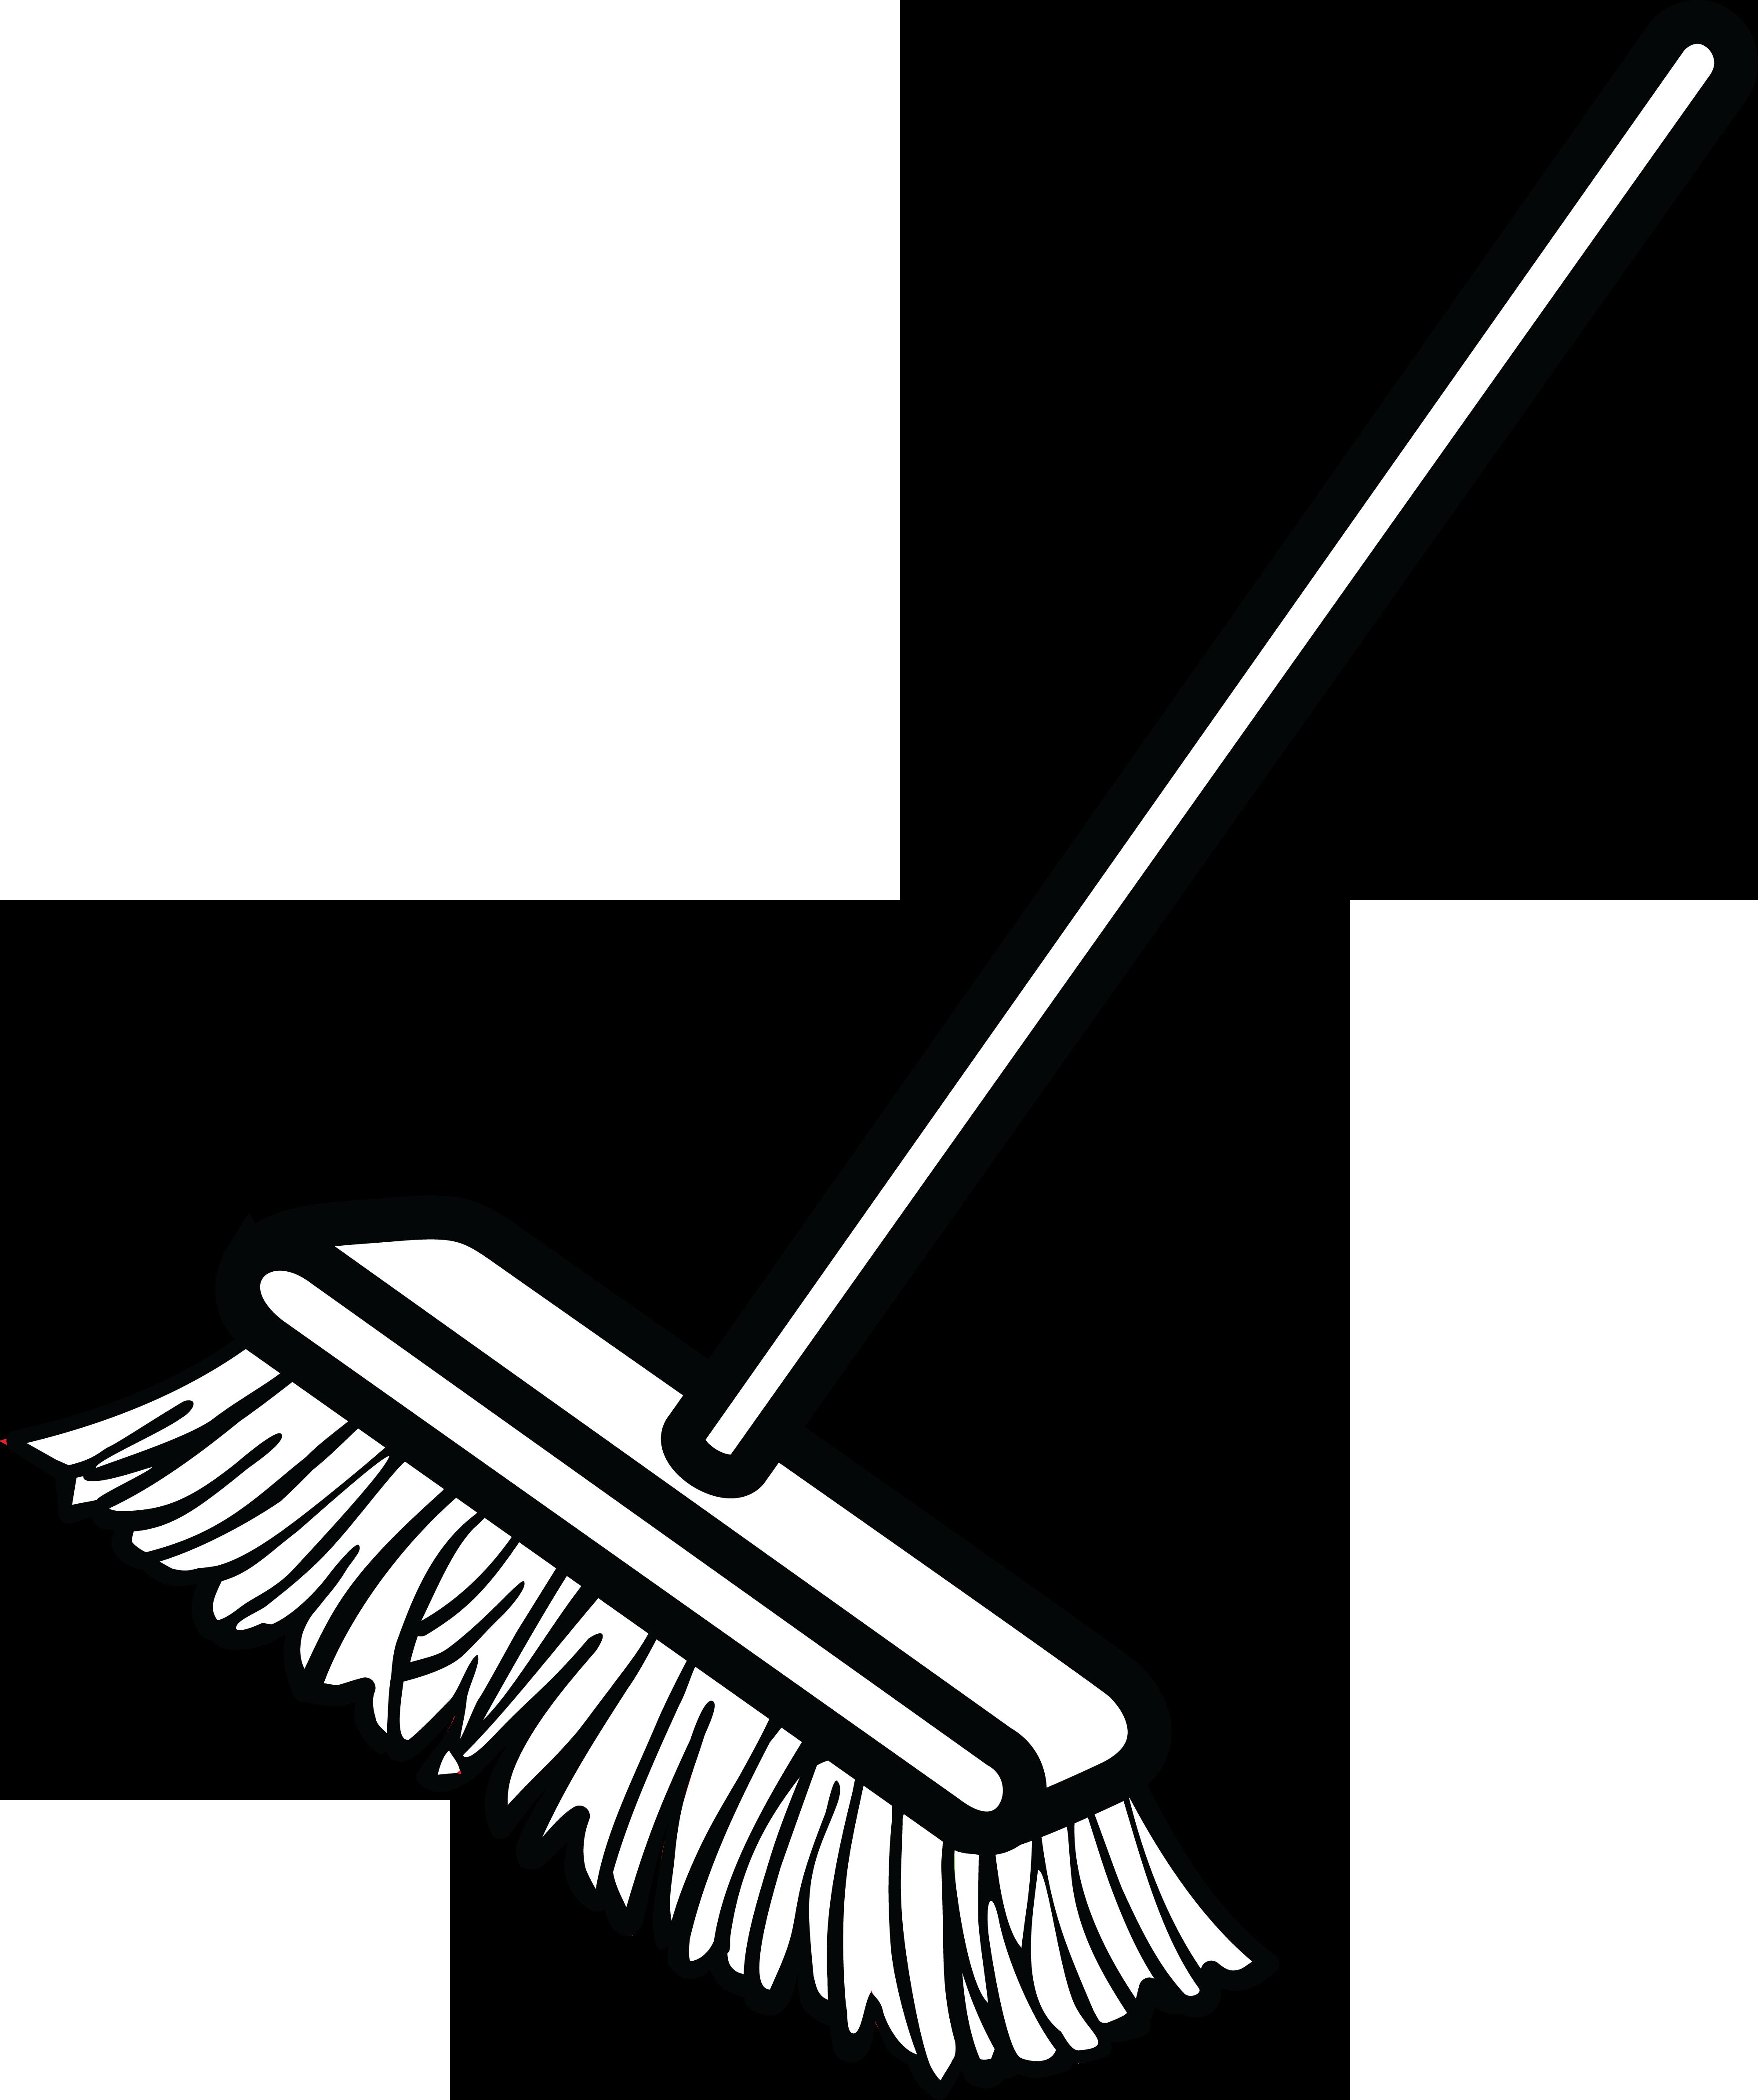 free clipart of a shop broom rh free clipartof com broom clipart free clipart broom sweeping